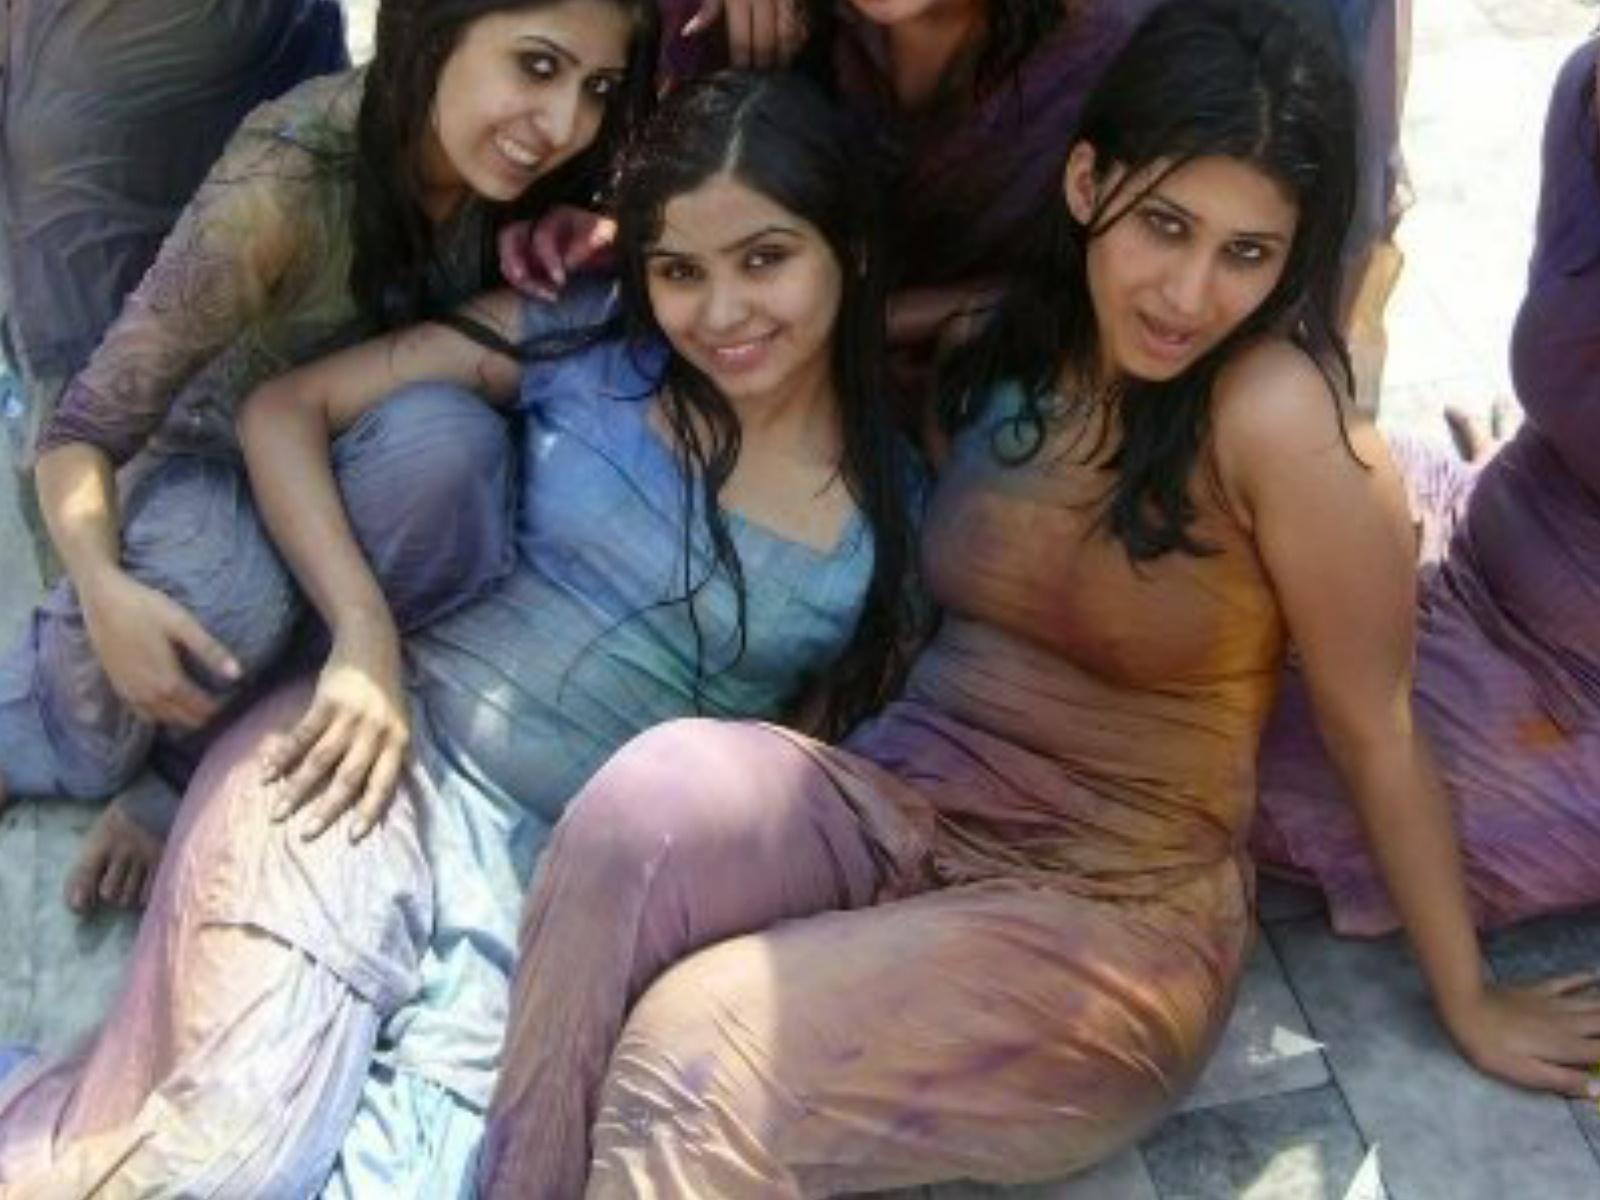 http://1.bp.blogspot.com/-BS7MYBH5DvU/TqeobnQhNhI/AAAAAAAADzk/XTkxnfG-El4/s1600/lahoreLumscollege-university-karachi-peshawar-local-hot-sexy-girls-wallpapers-photos-images+%25287%2529.jpg